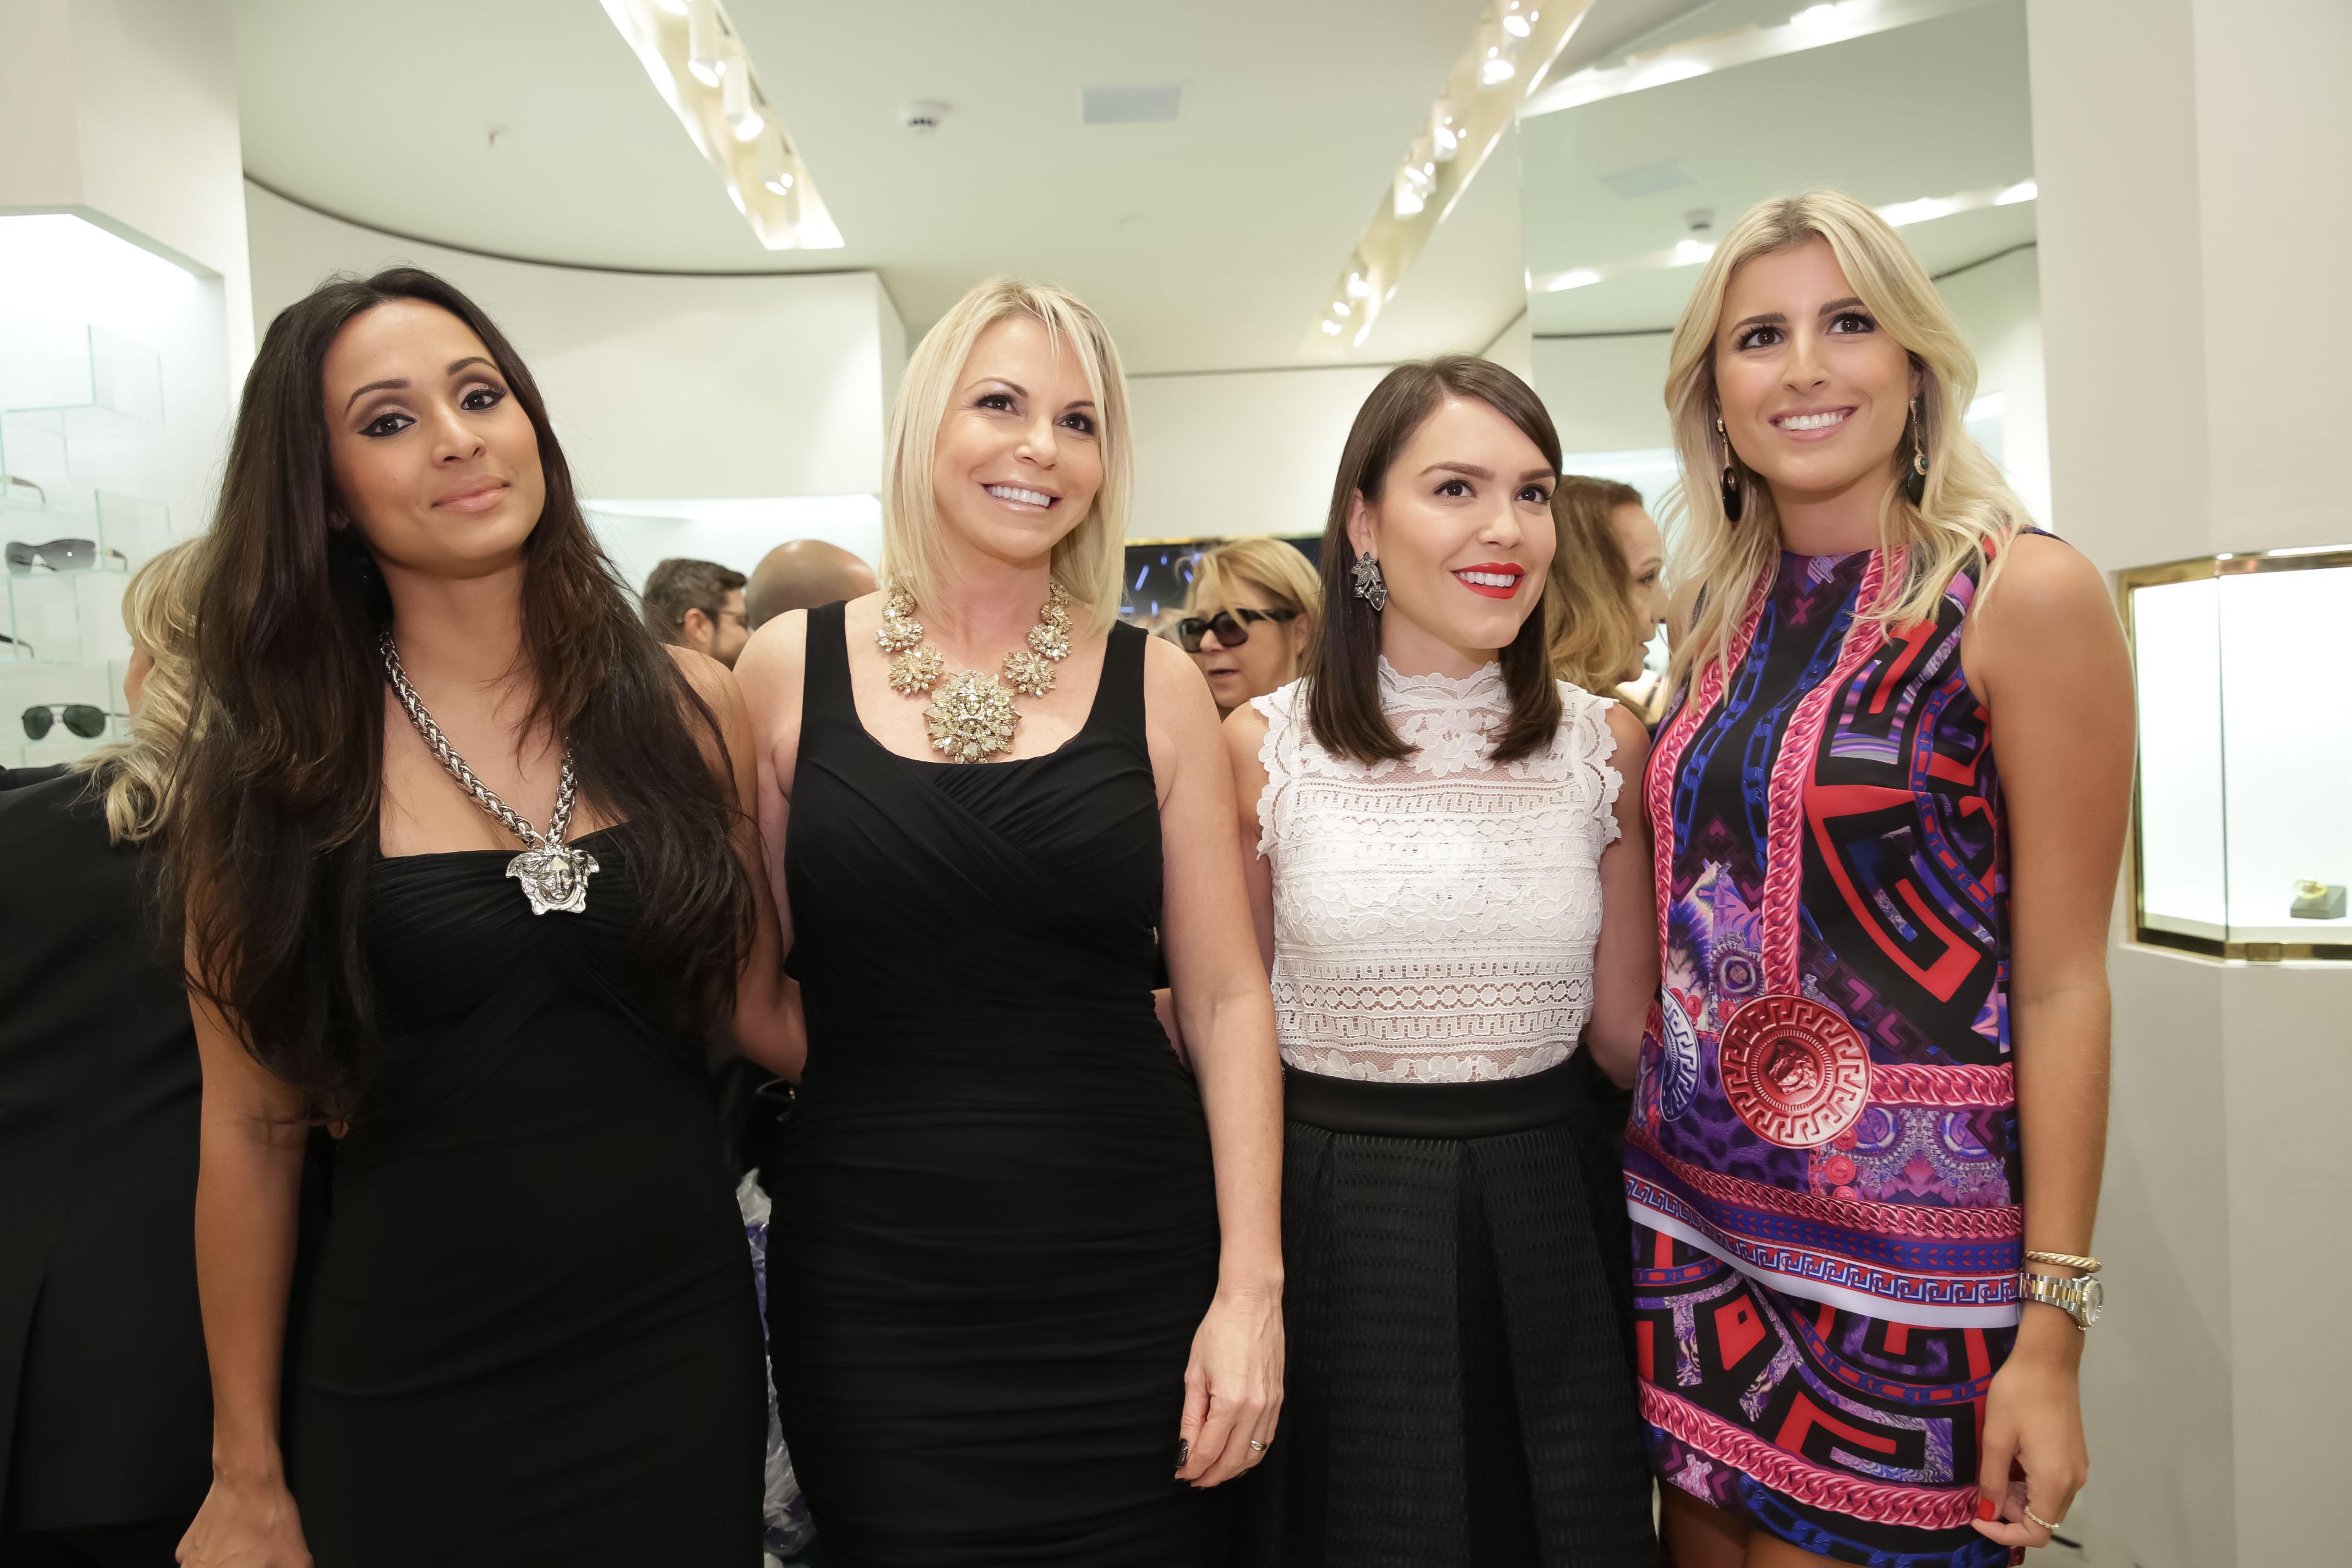 Thaissa Carvalho, Nina Kauffmann, Lari Duarte e Dandynha Barbosa_7476